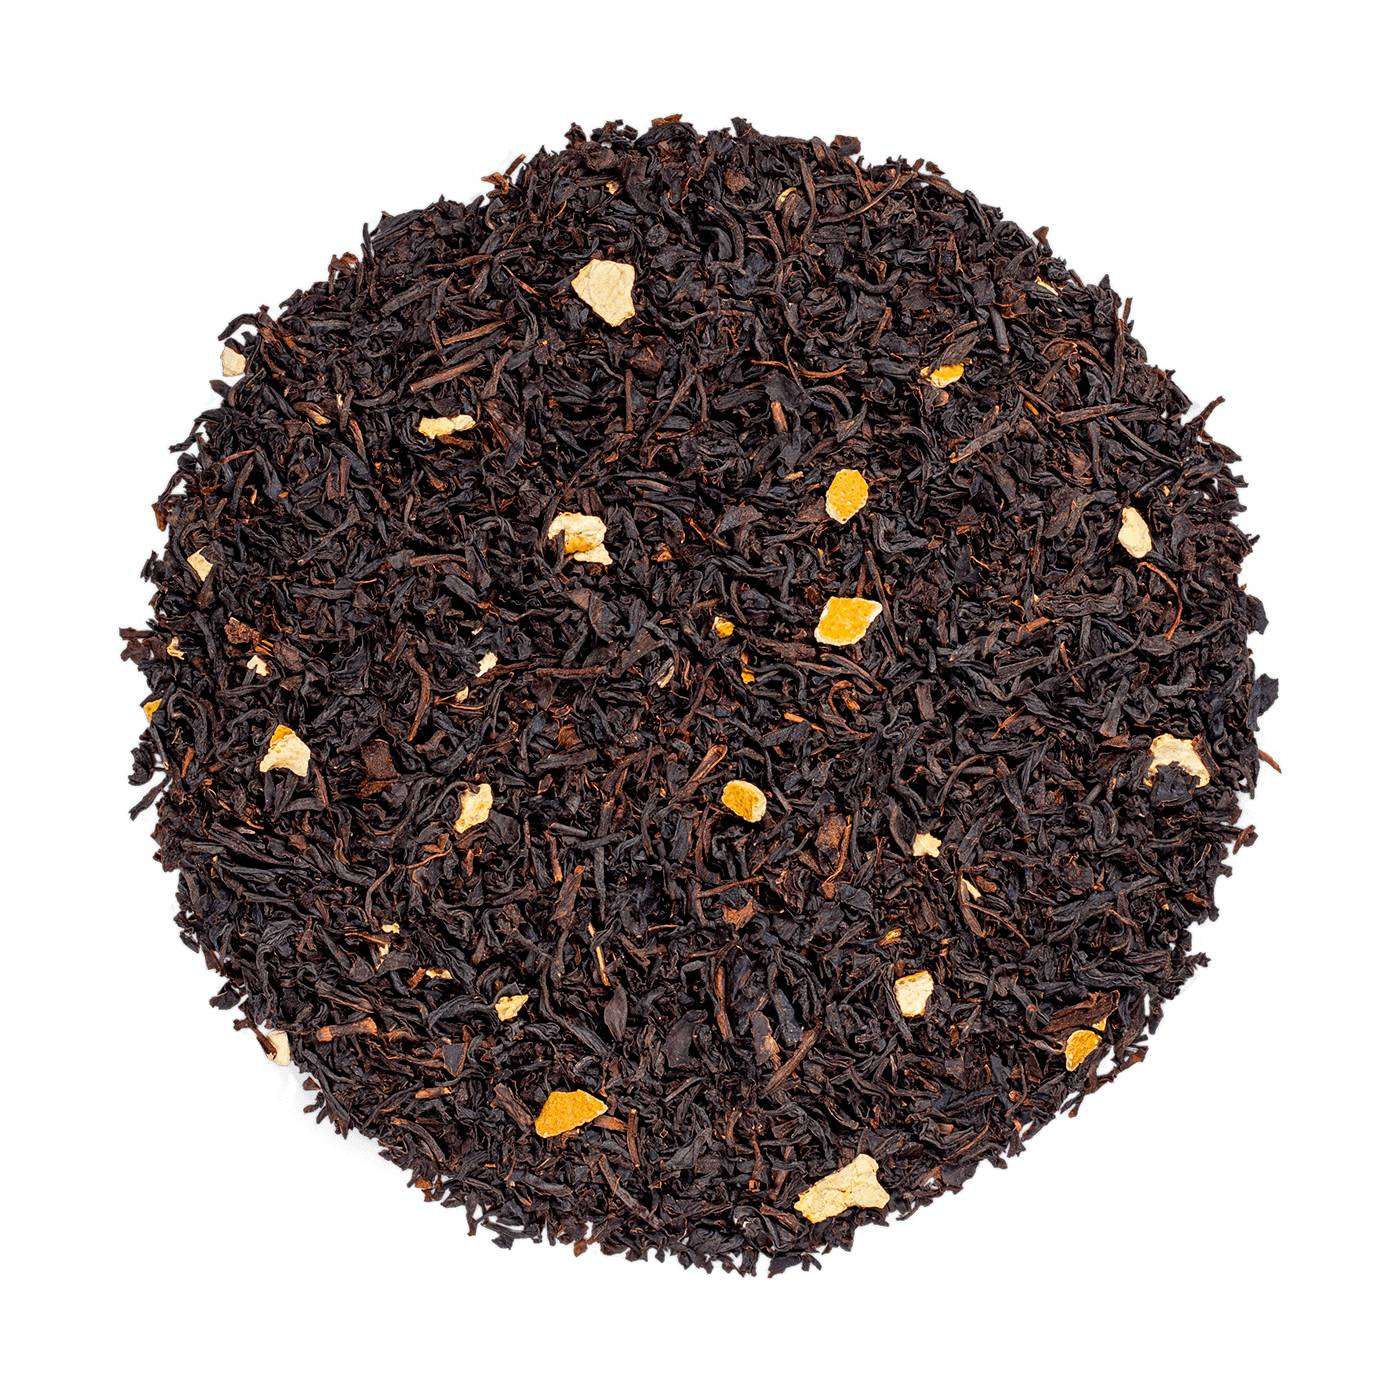 KUSMI TEA Earl Grey Intense bio - Thé noir, bergamote, citron - Thé en vrac - Kusmi Tea